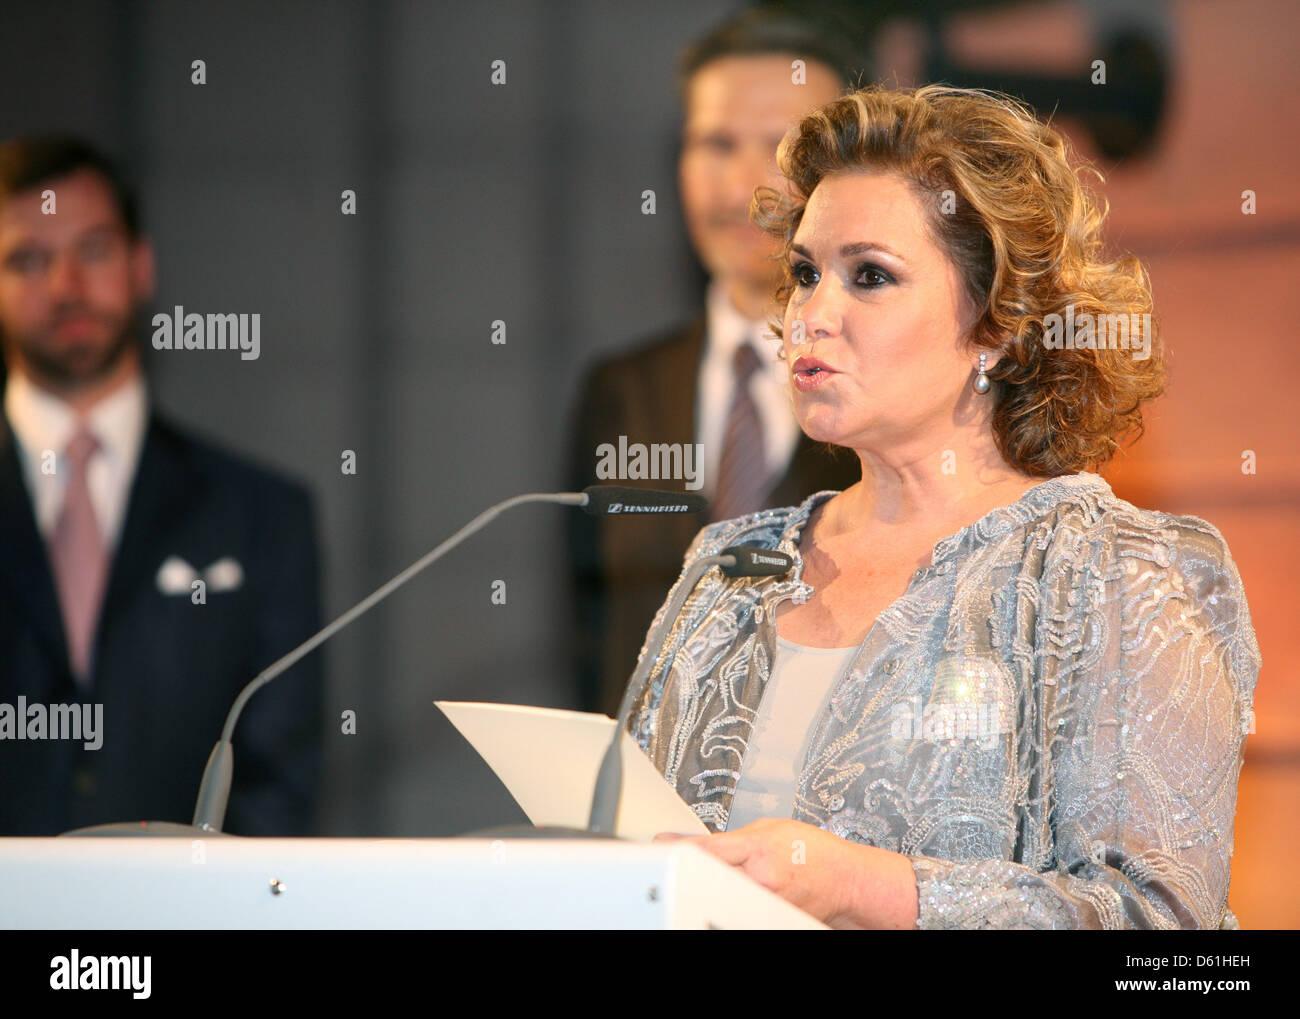 Grand Duchess Maria Teresa speaks at the German Historical Museum in Berlin, Germany, 24 April 2012. The Grand Duke - Stock Image